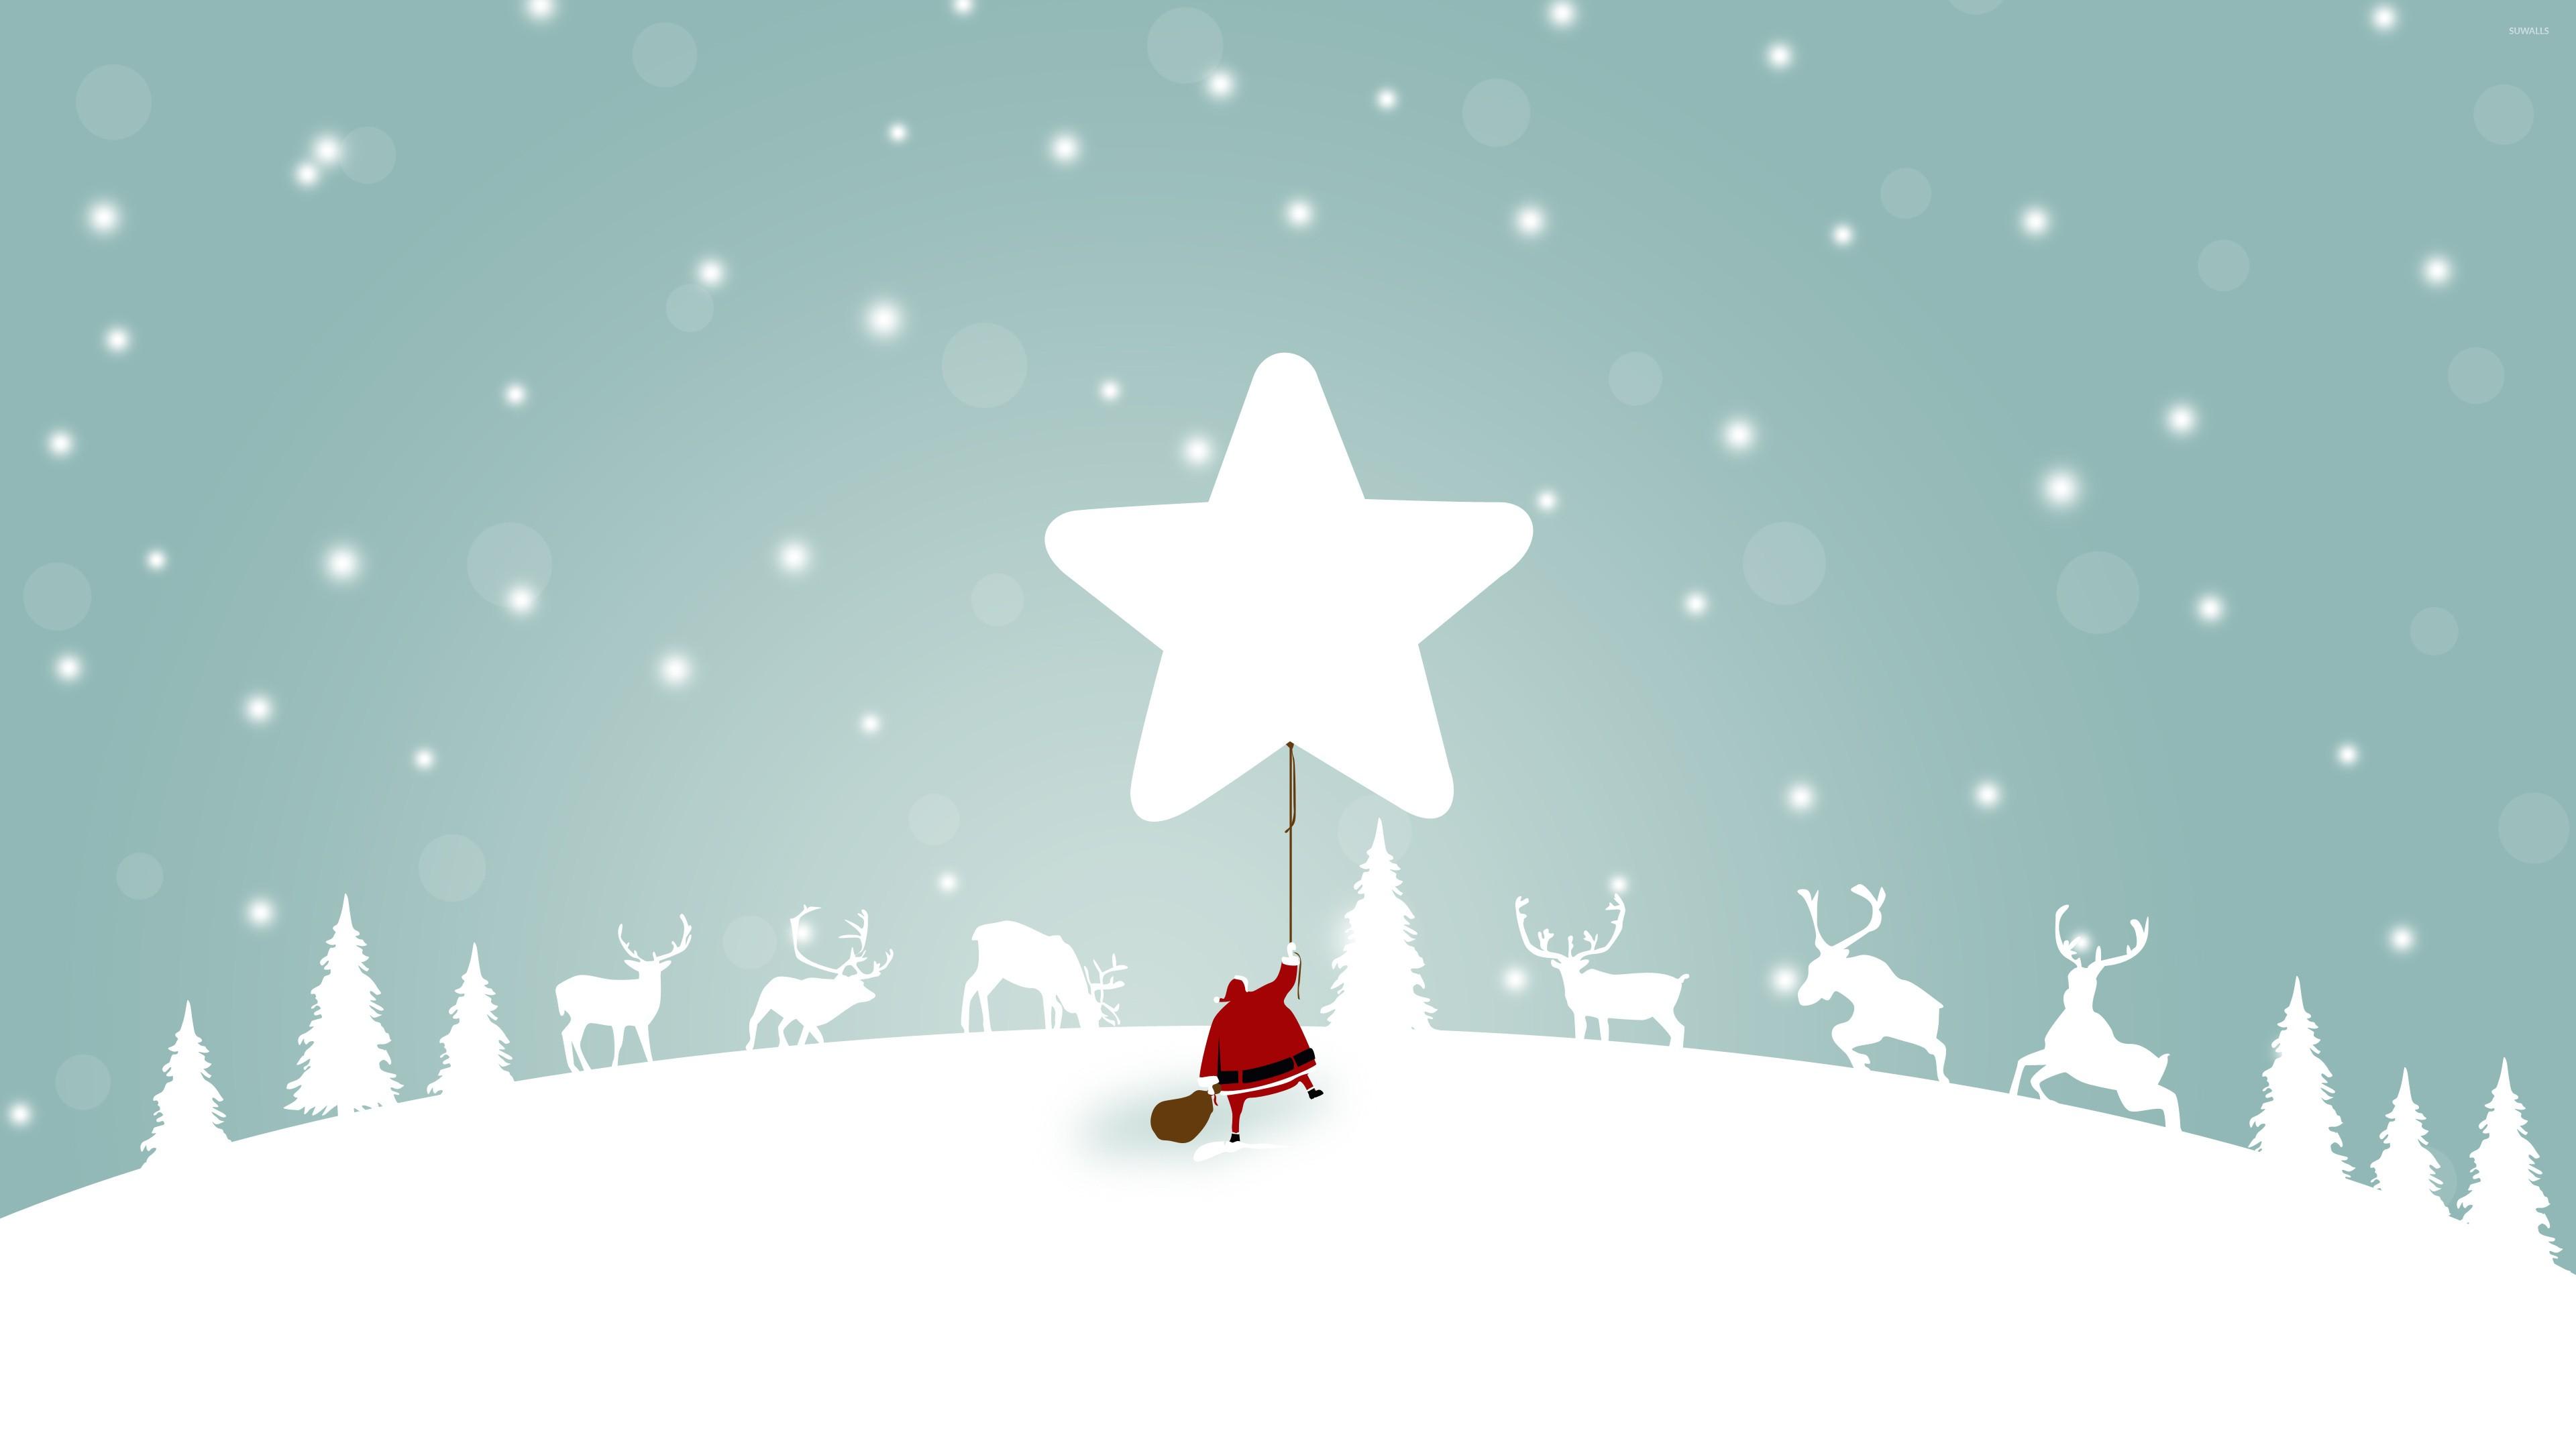 santa sky snow wallpaper - photo #14